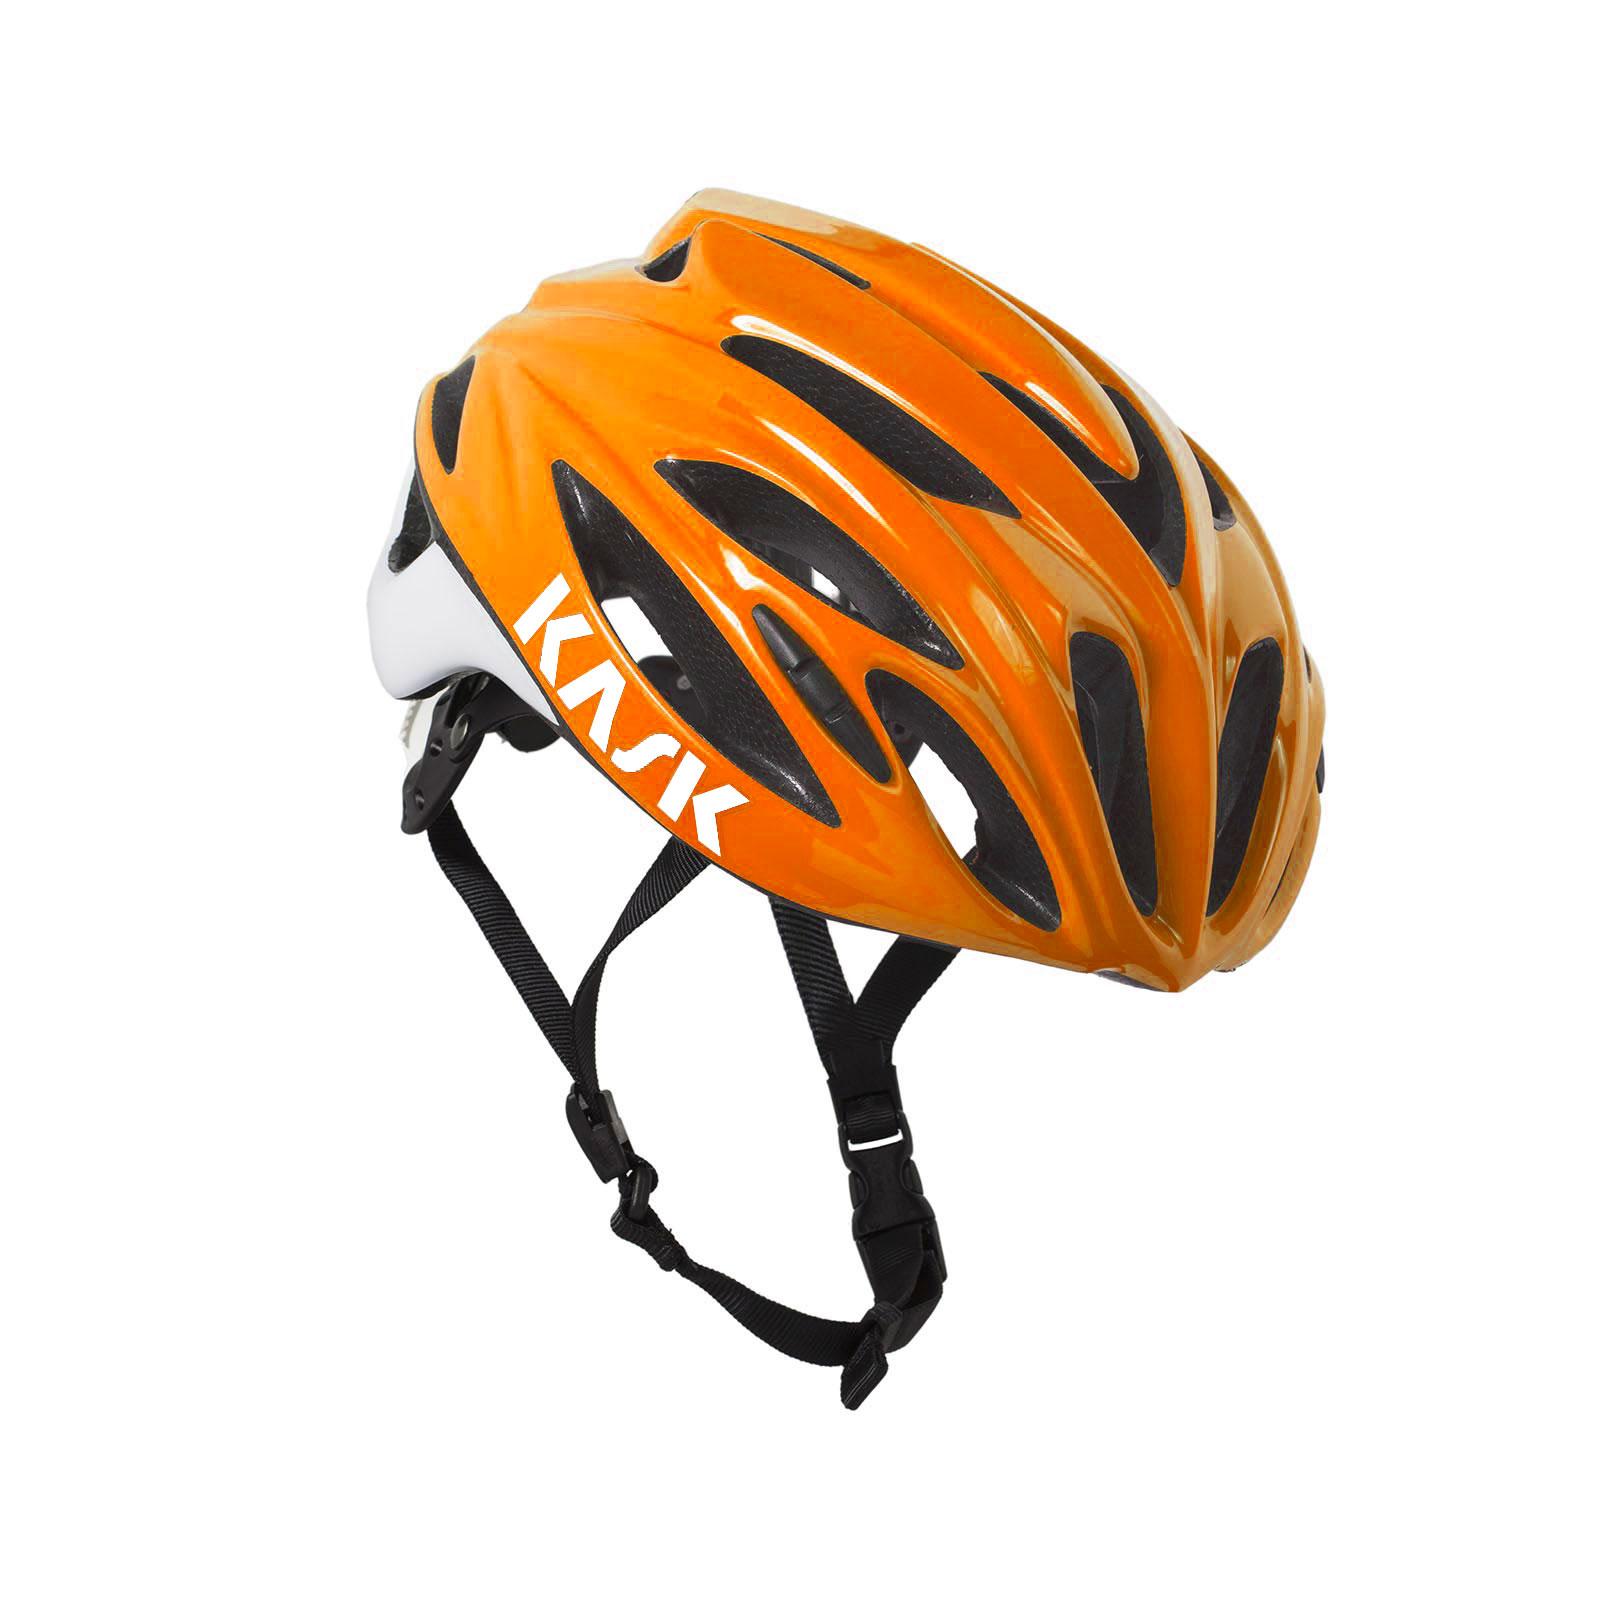 Ventilated Bike Helmet with Optimal Protection - RAPIDO ‹ Kask Sport c259aafdb